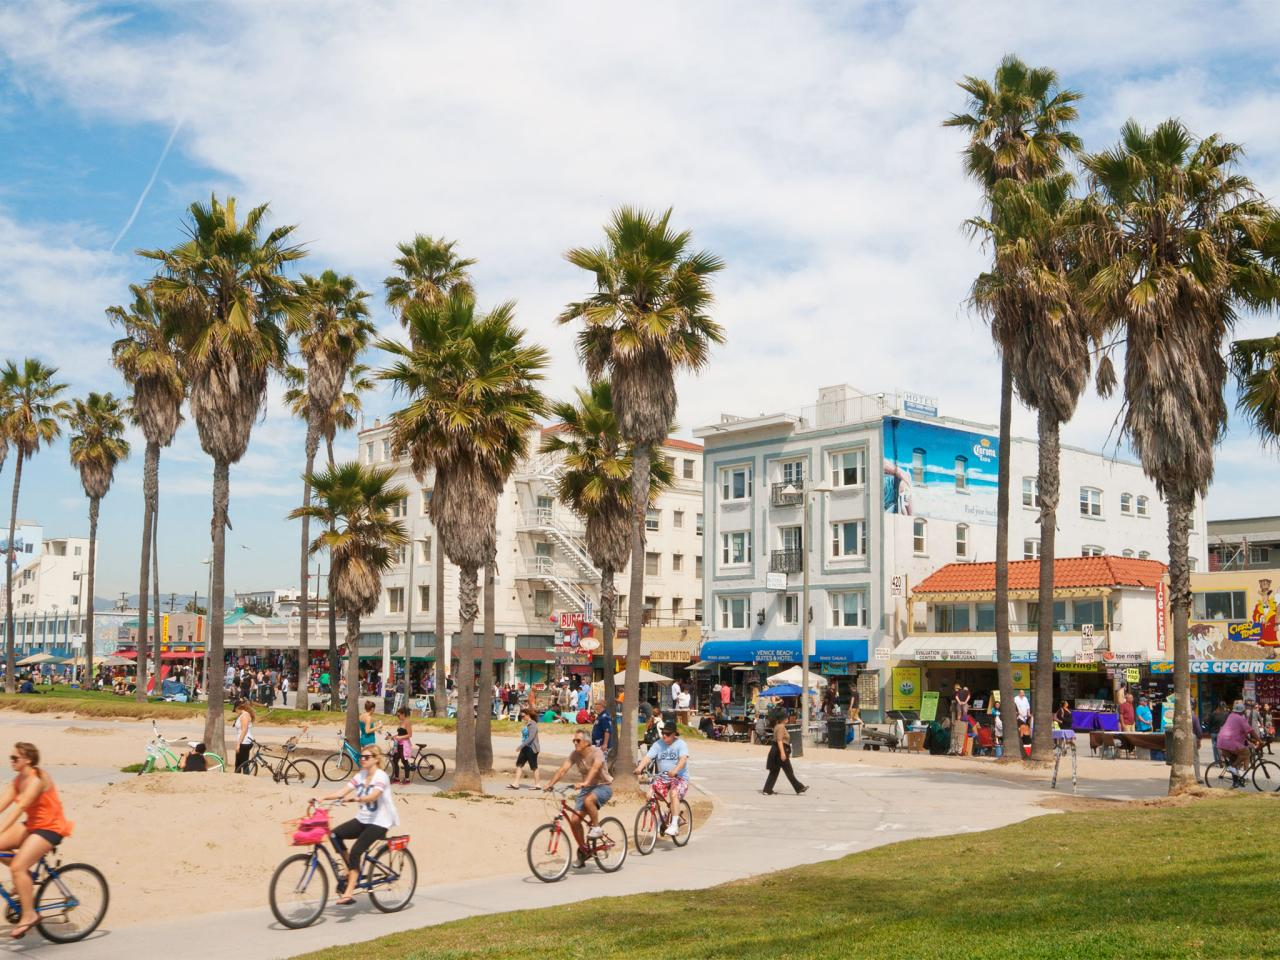 Boardwalk Things To Do In Venice Beach